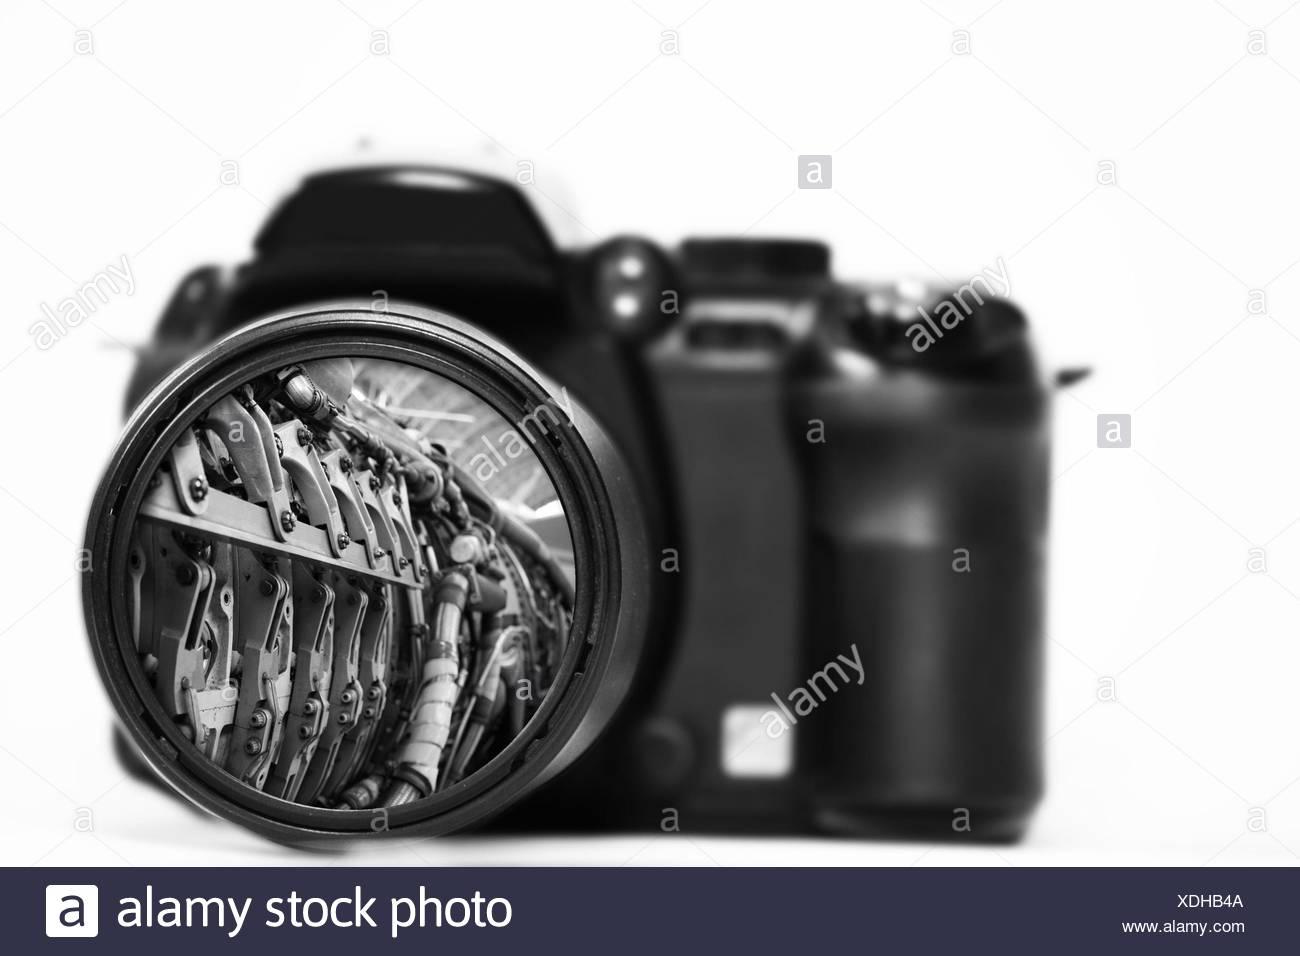 Camera - Stock Image